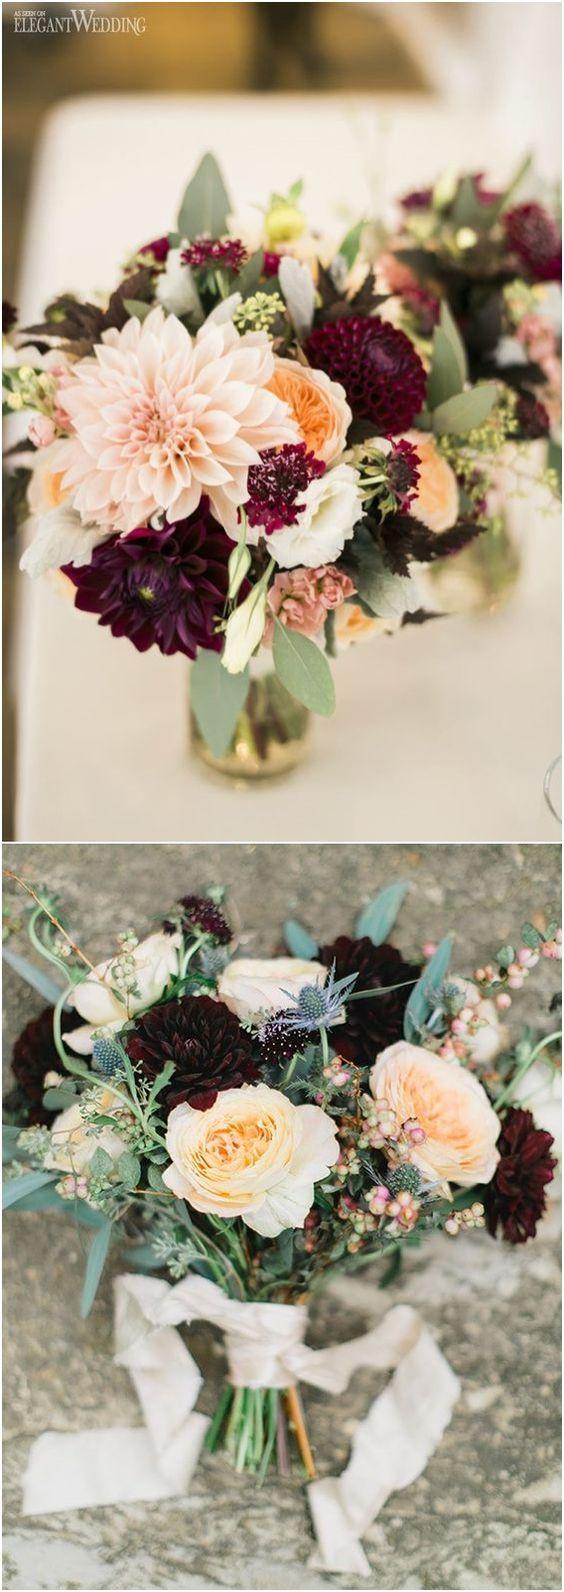 40 Burgundy Wedding Bouquets For Fall Winter Wedding Creative